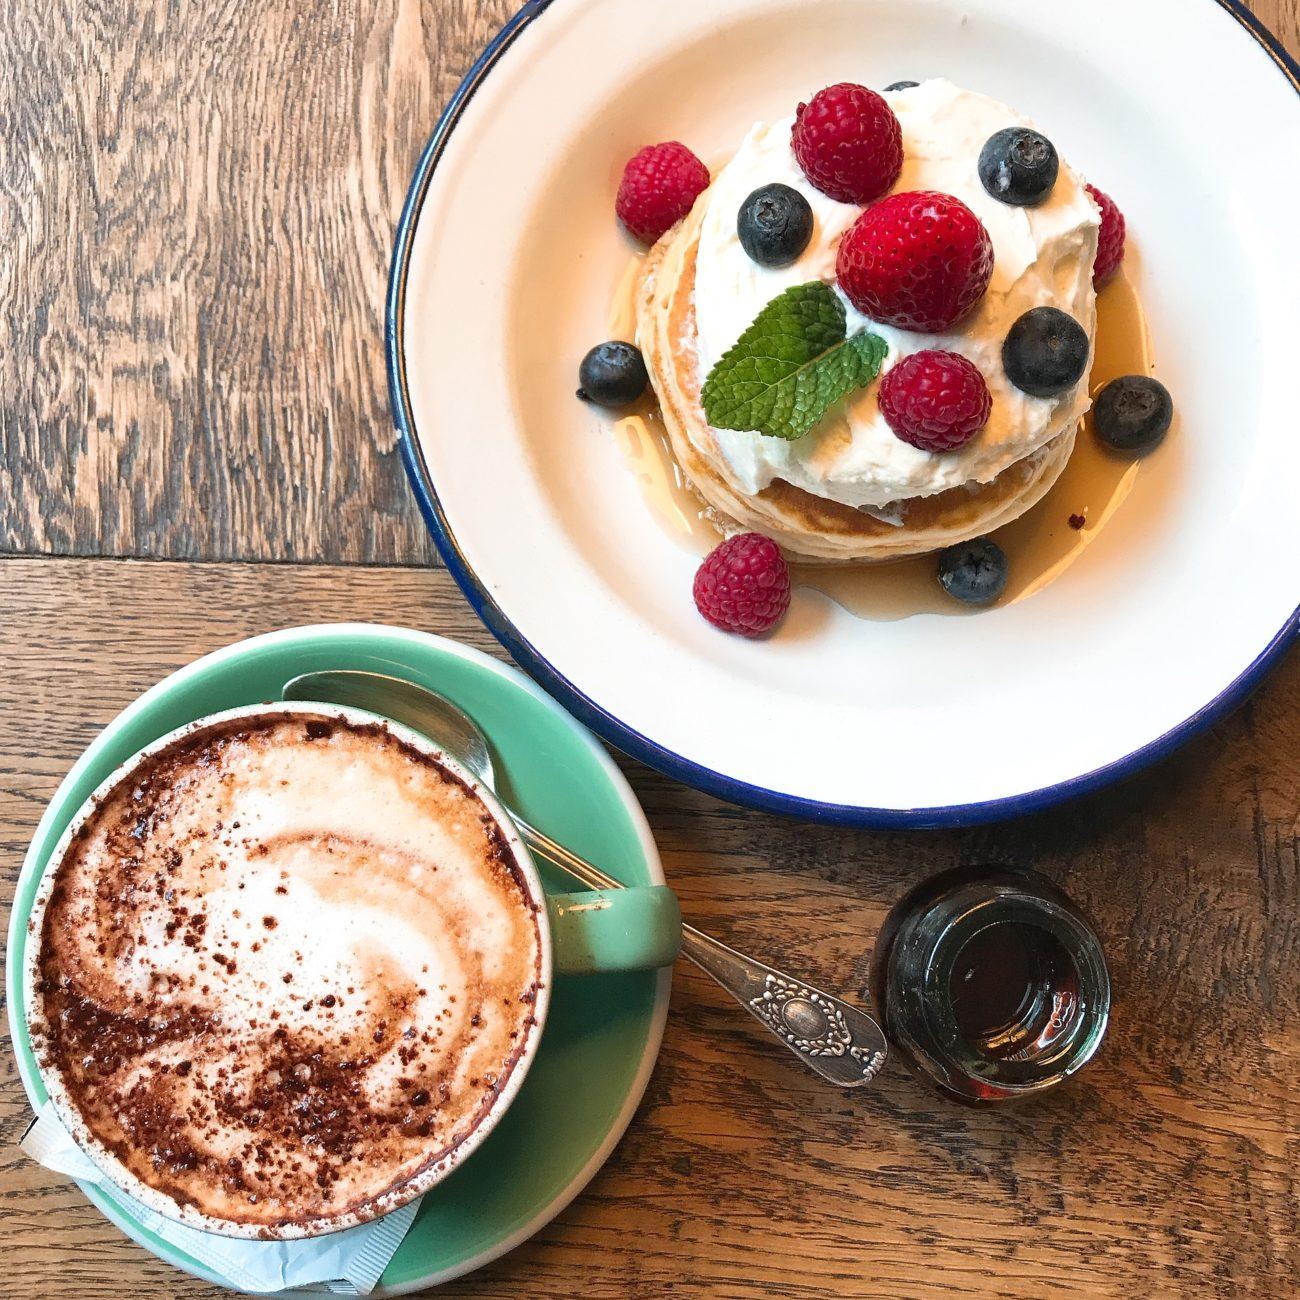 Cosa mangiavano i geni a colazione cenaunavoltablog